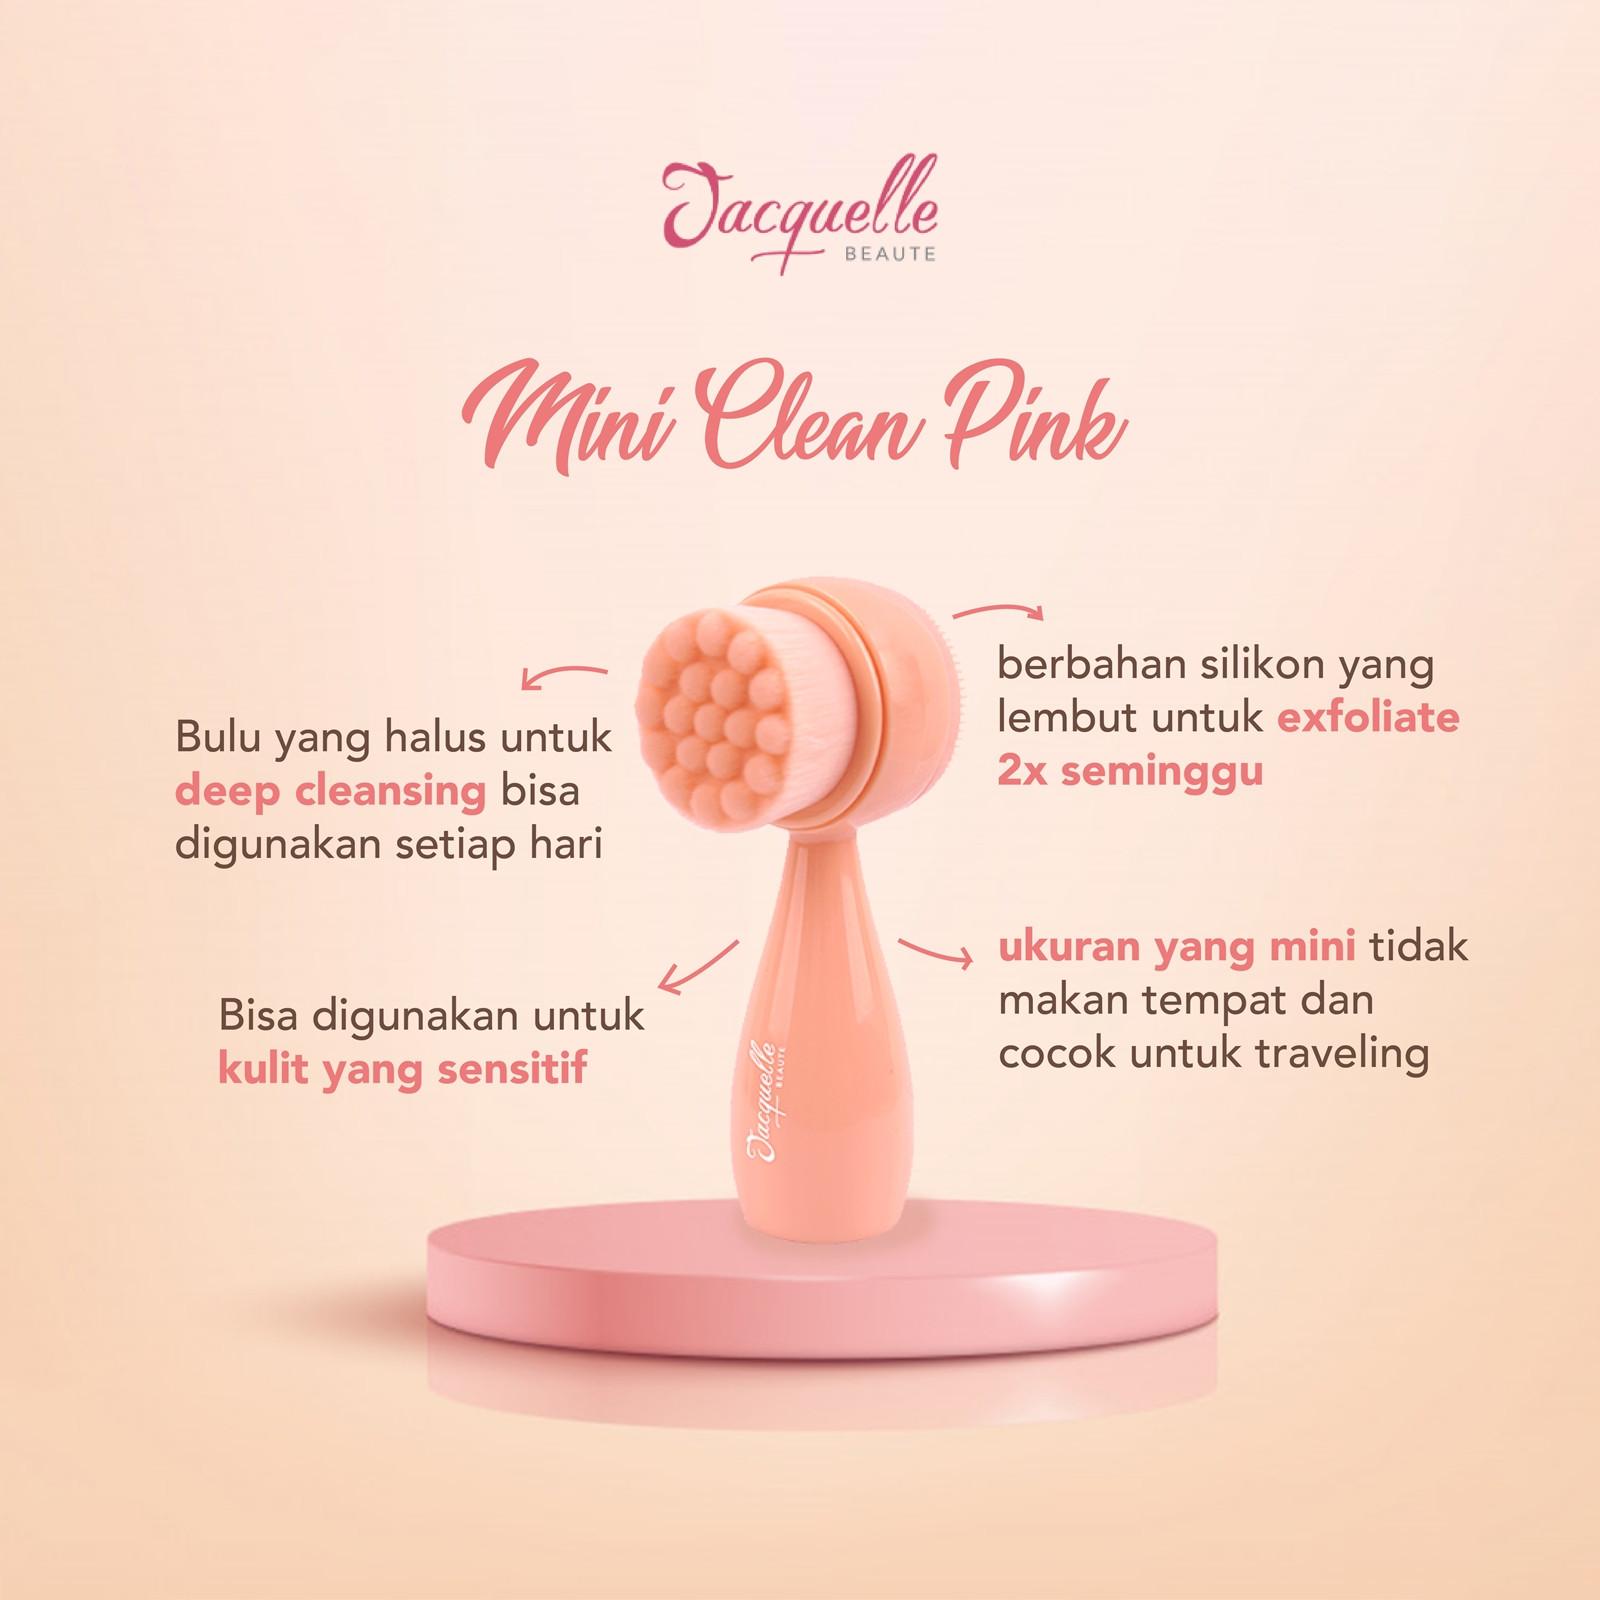 Mini Clean Pink